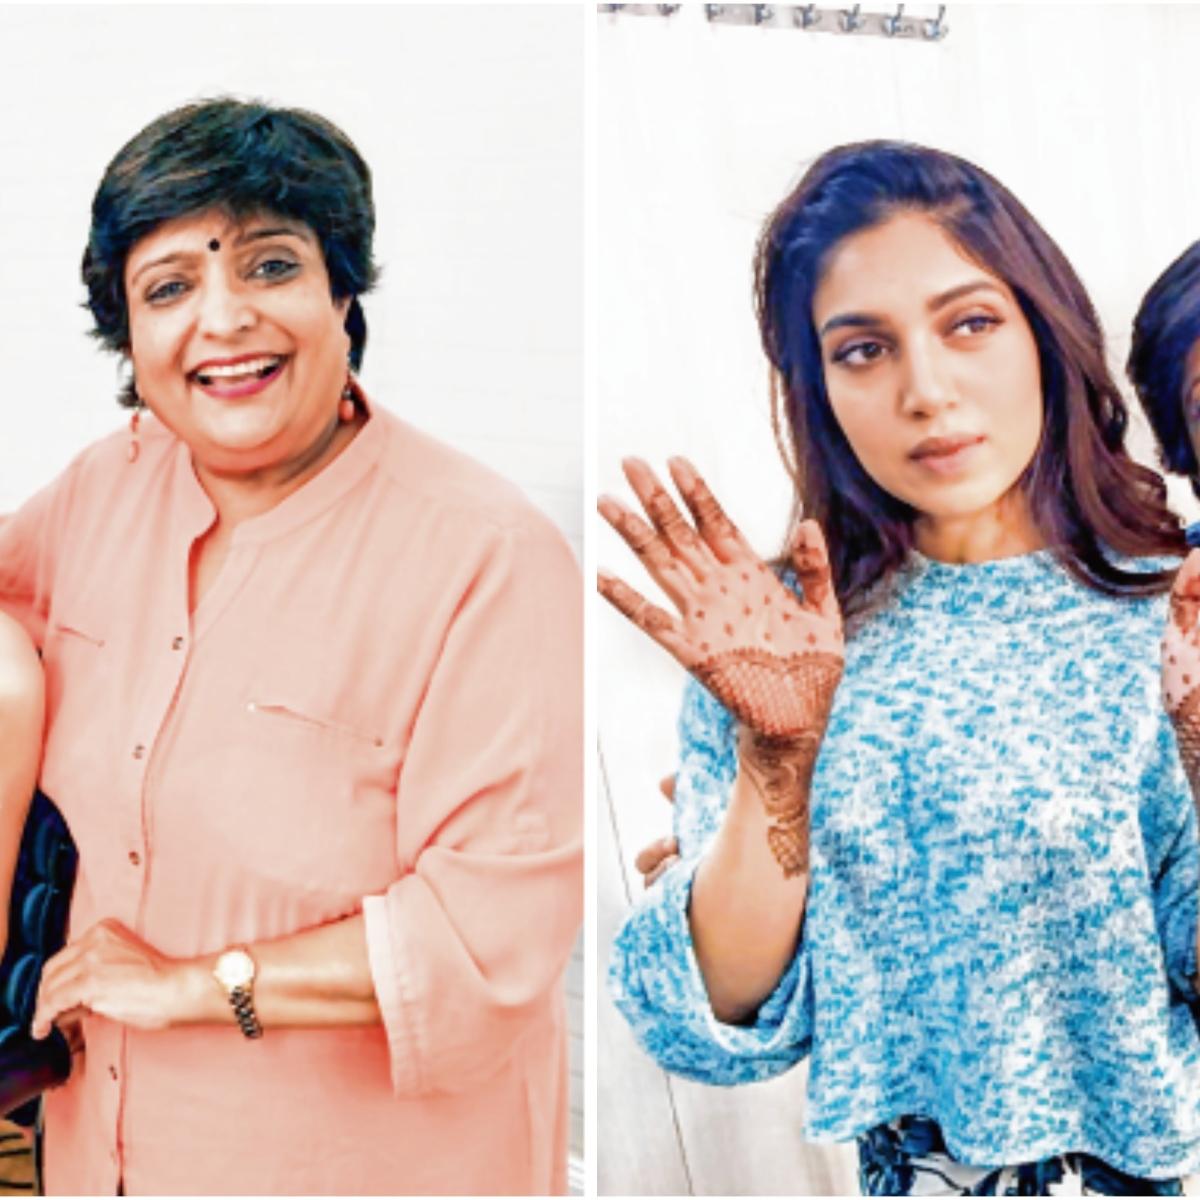 Mumbaiya Gujarati: What's Deepika and Sonam's mehendi artist Veena Nagda up to?